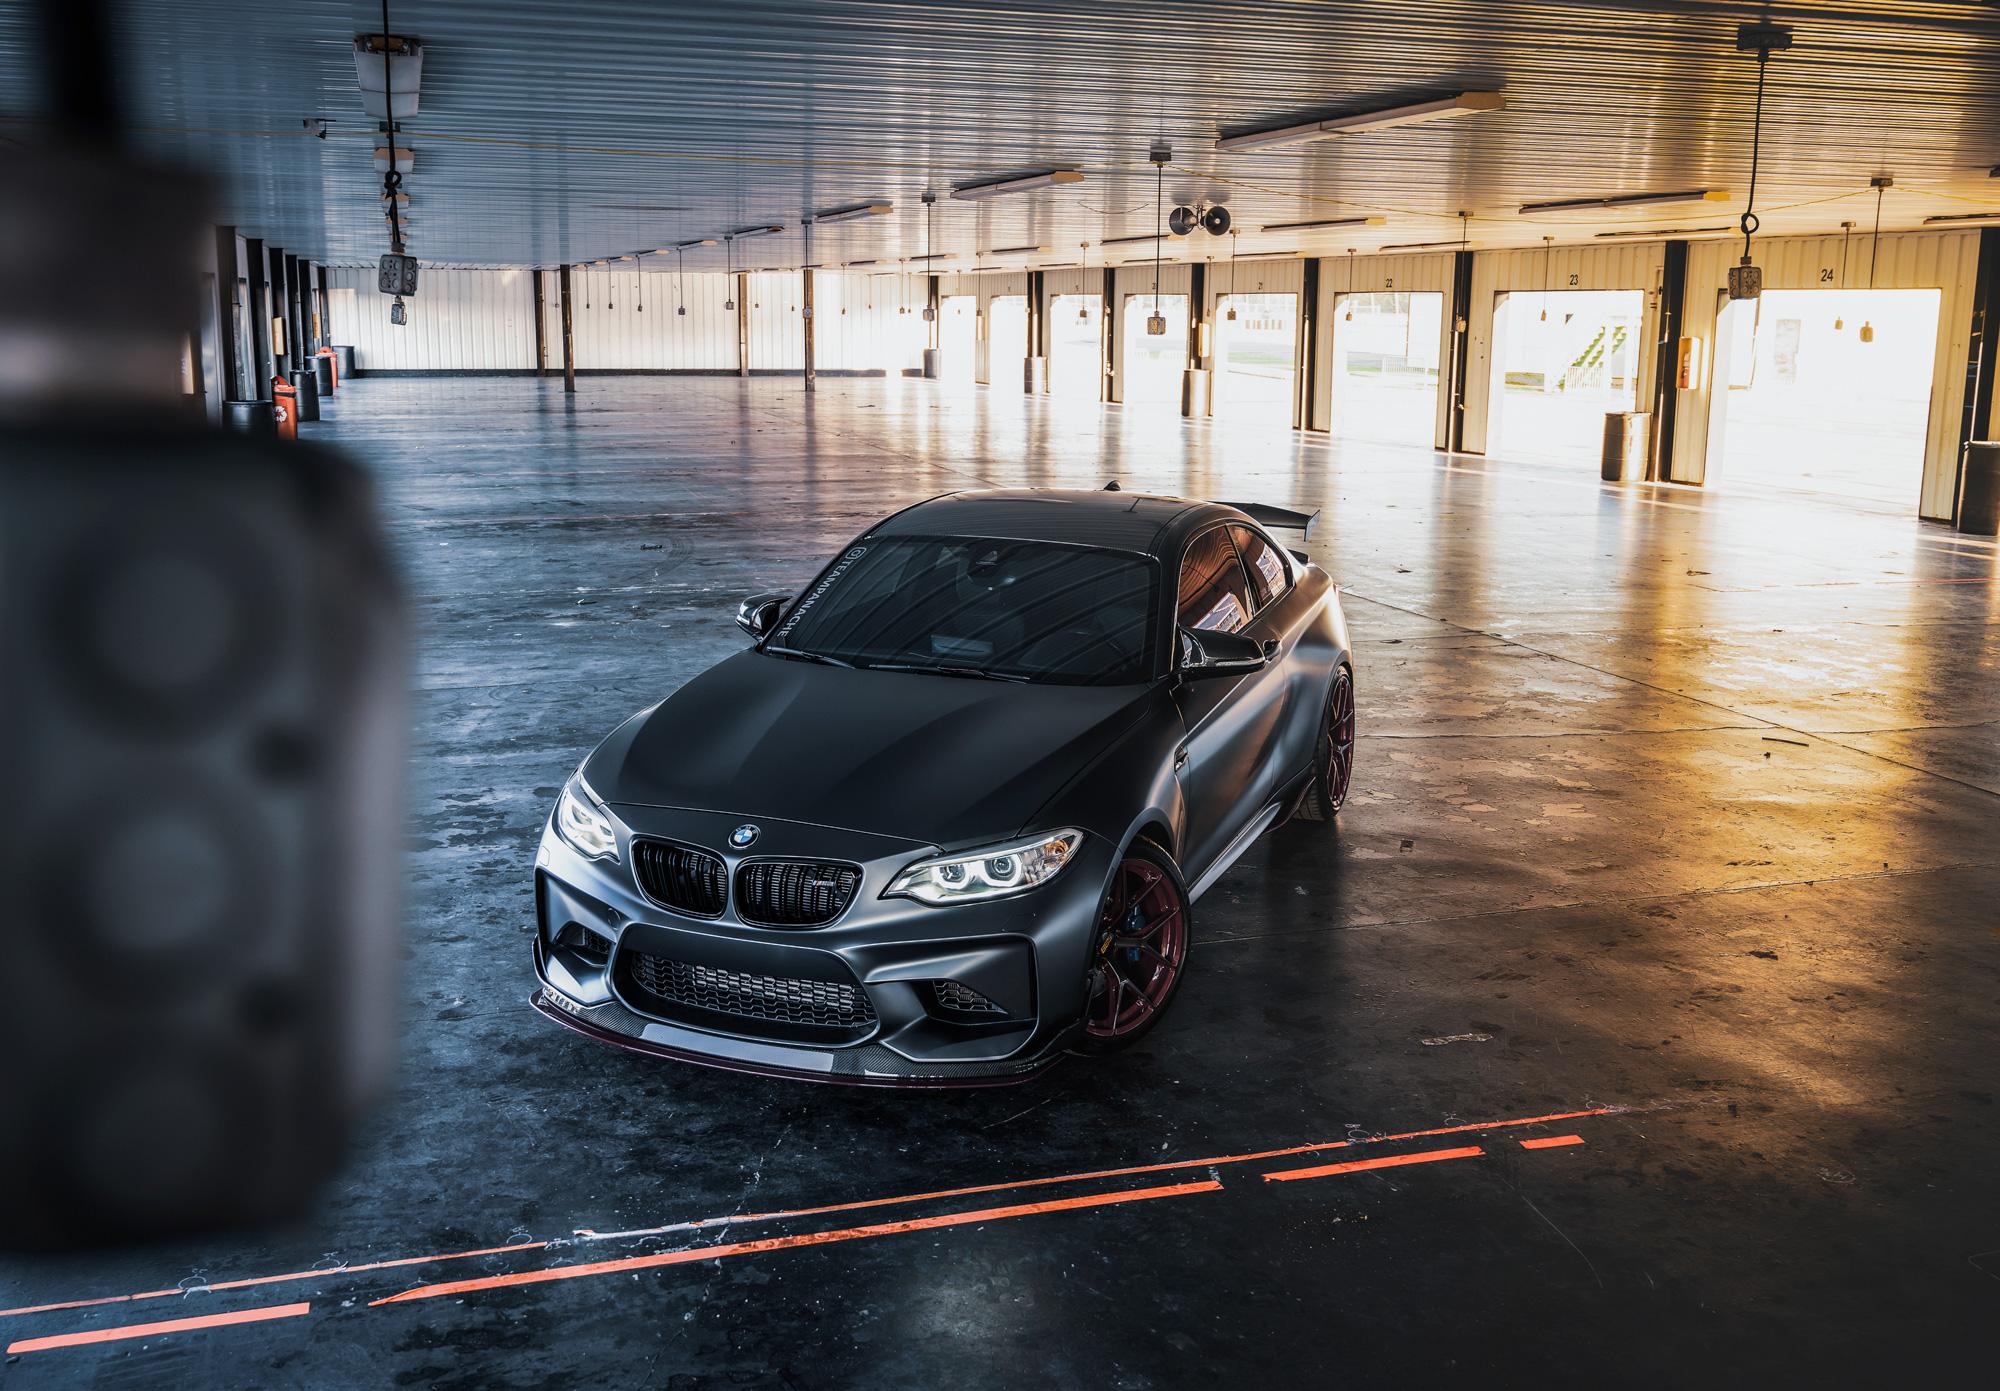 M2 Pocono garage